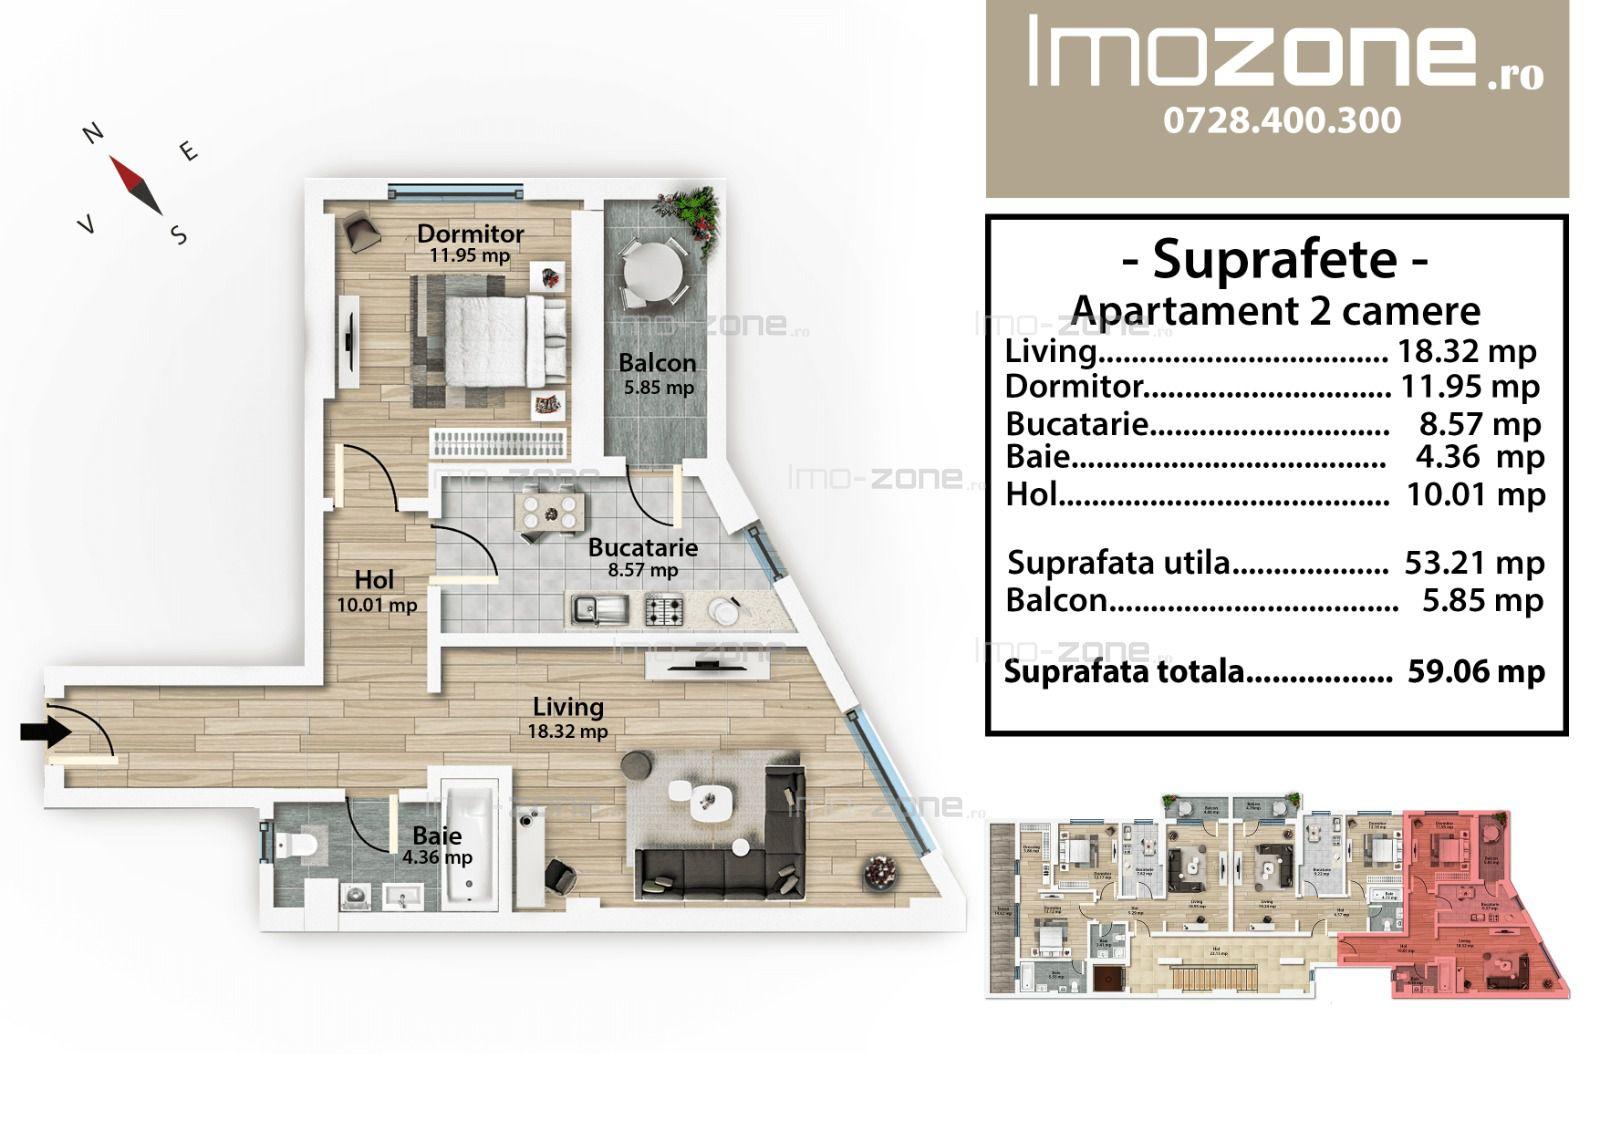 Lidl, Plaza, bloc nou, 2 camere, dec. 3/6, bucatarie inchisa, geam baie, metrou